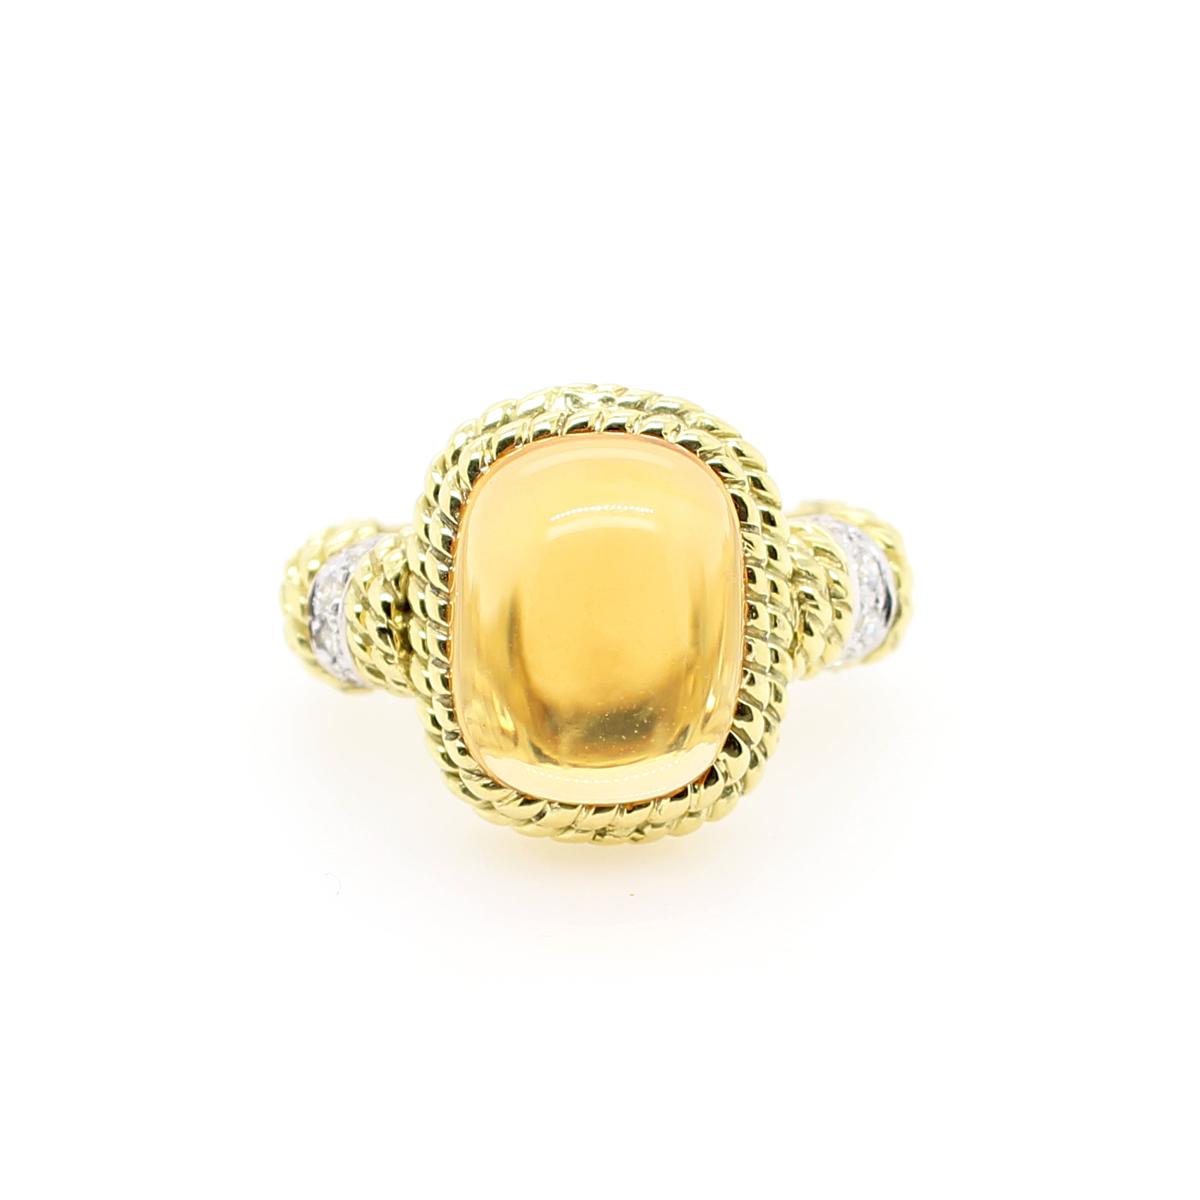 18 Karat Yellow Gold Cabochon Citrine and Diamond Ring